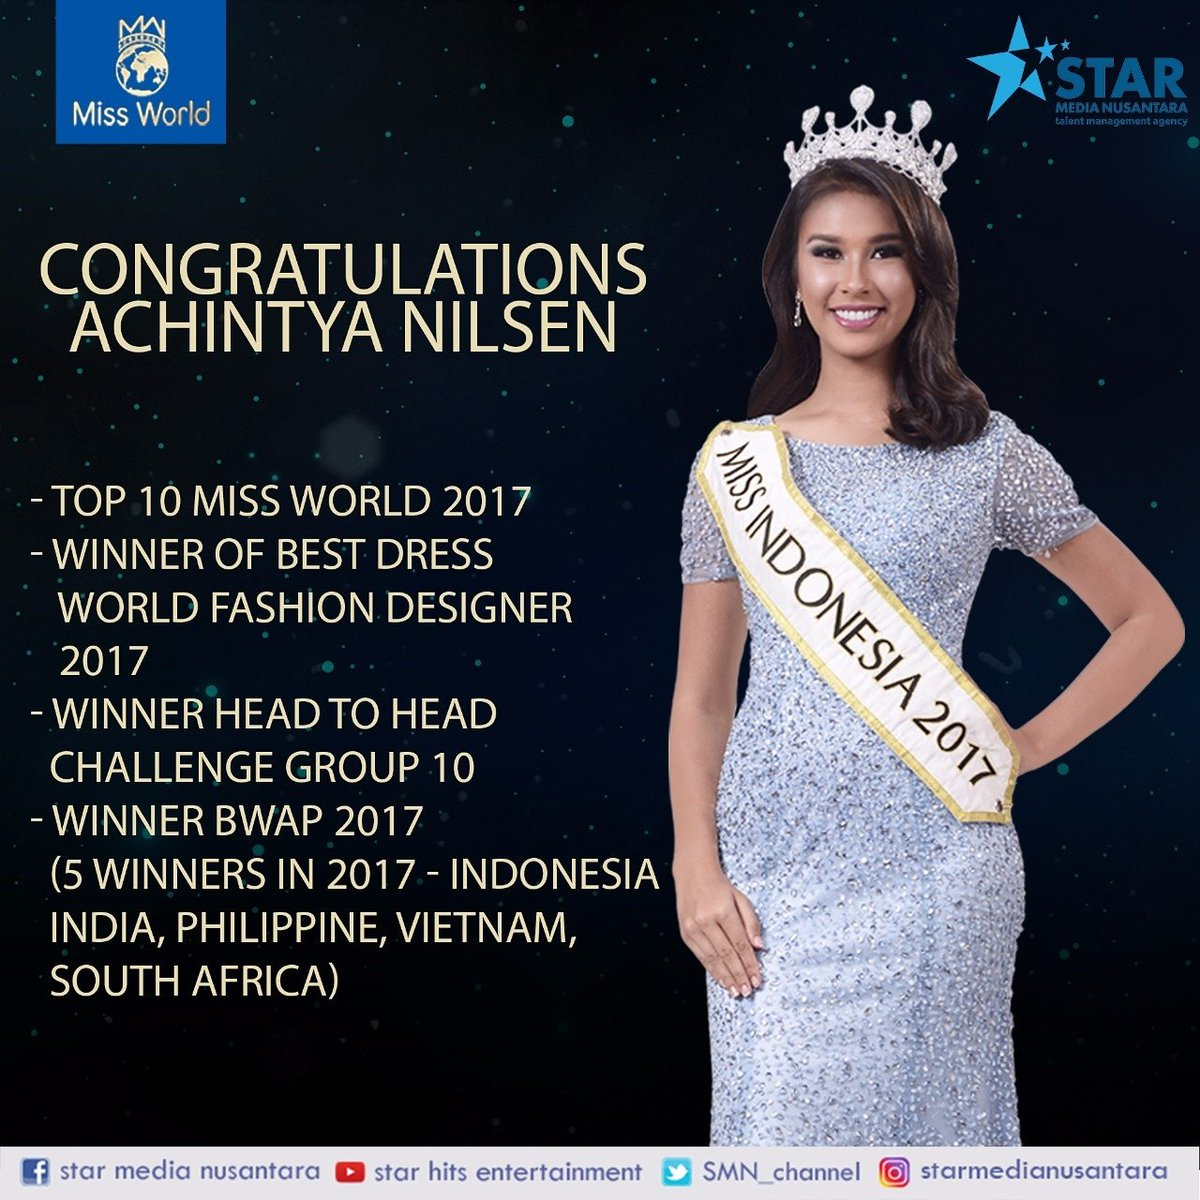 Hitsrec On Twitter Congratulations Tyanilsen Top 10 Miss World 2017 Winner Of Best Dress World Fashion Designer 2017 Winner Head To Head Challenge Group 10 Winner Bwap 2017 5 Winners On 2017